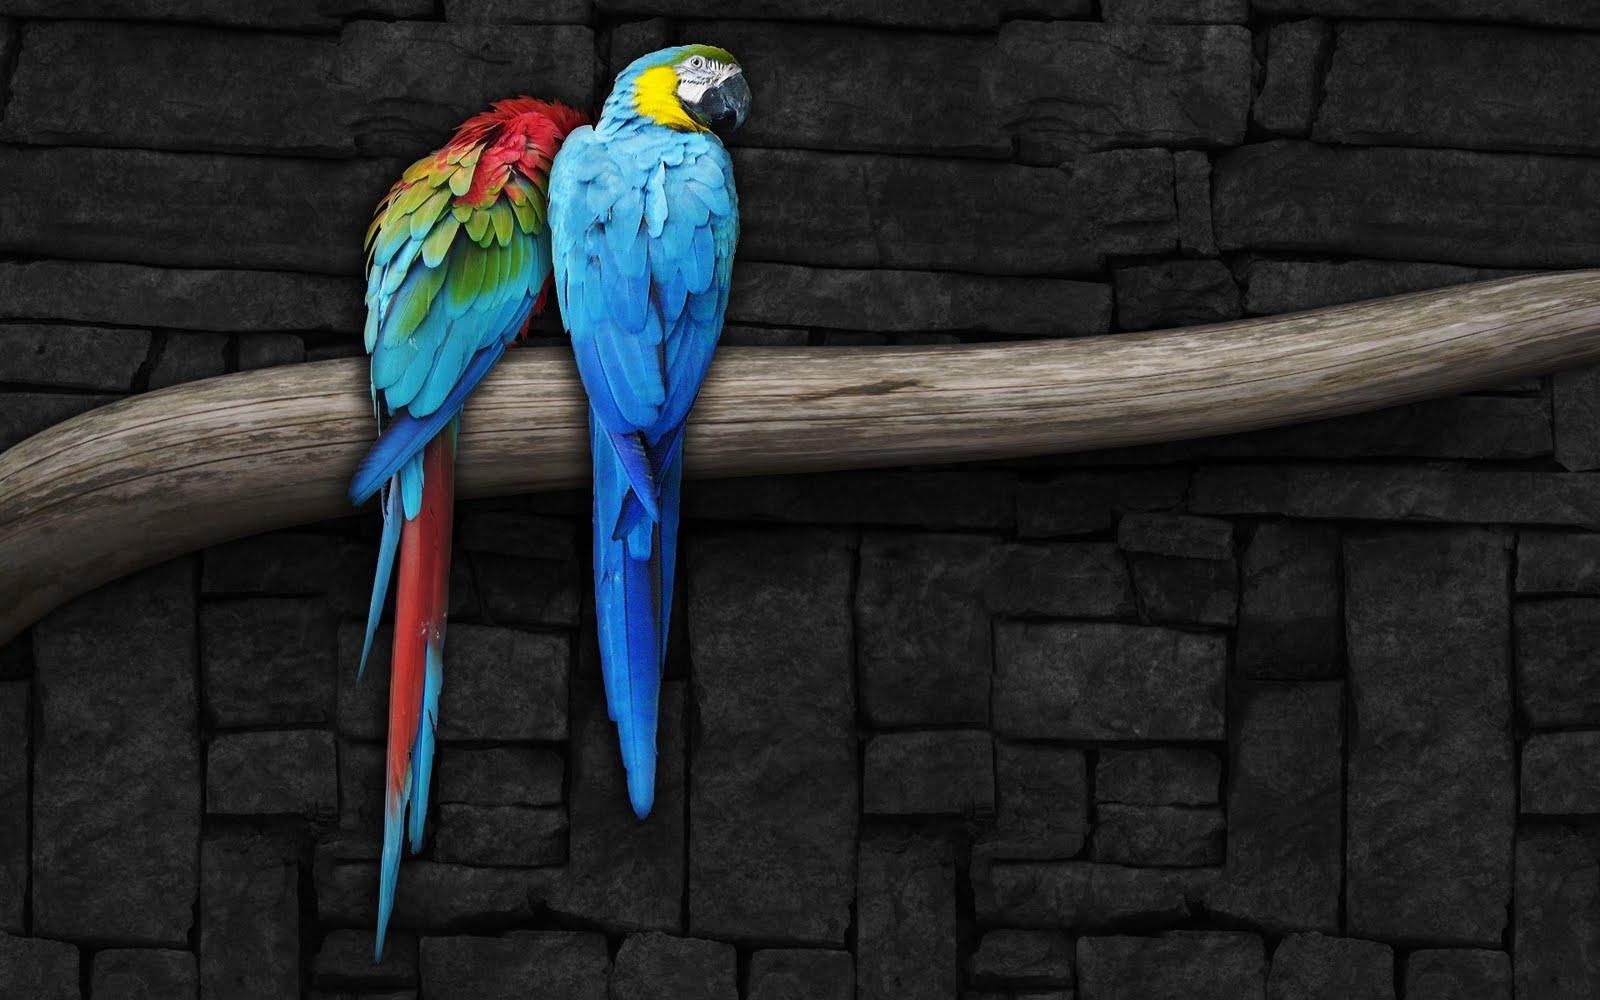 http://1.bp.blogspot.com/-wM3gMbAOTeI/TmOKInyWbZI/AAAAAAAADGc/vbSt-27uD2Q/s1600/pair_of_parrots.jpg